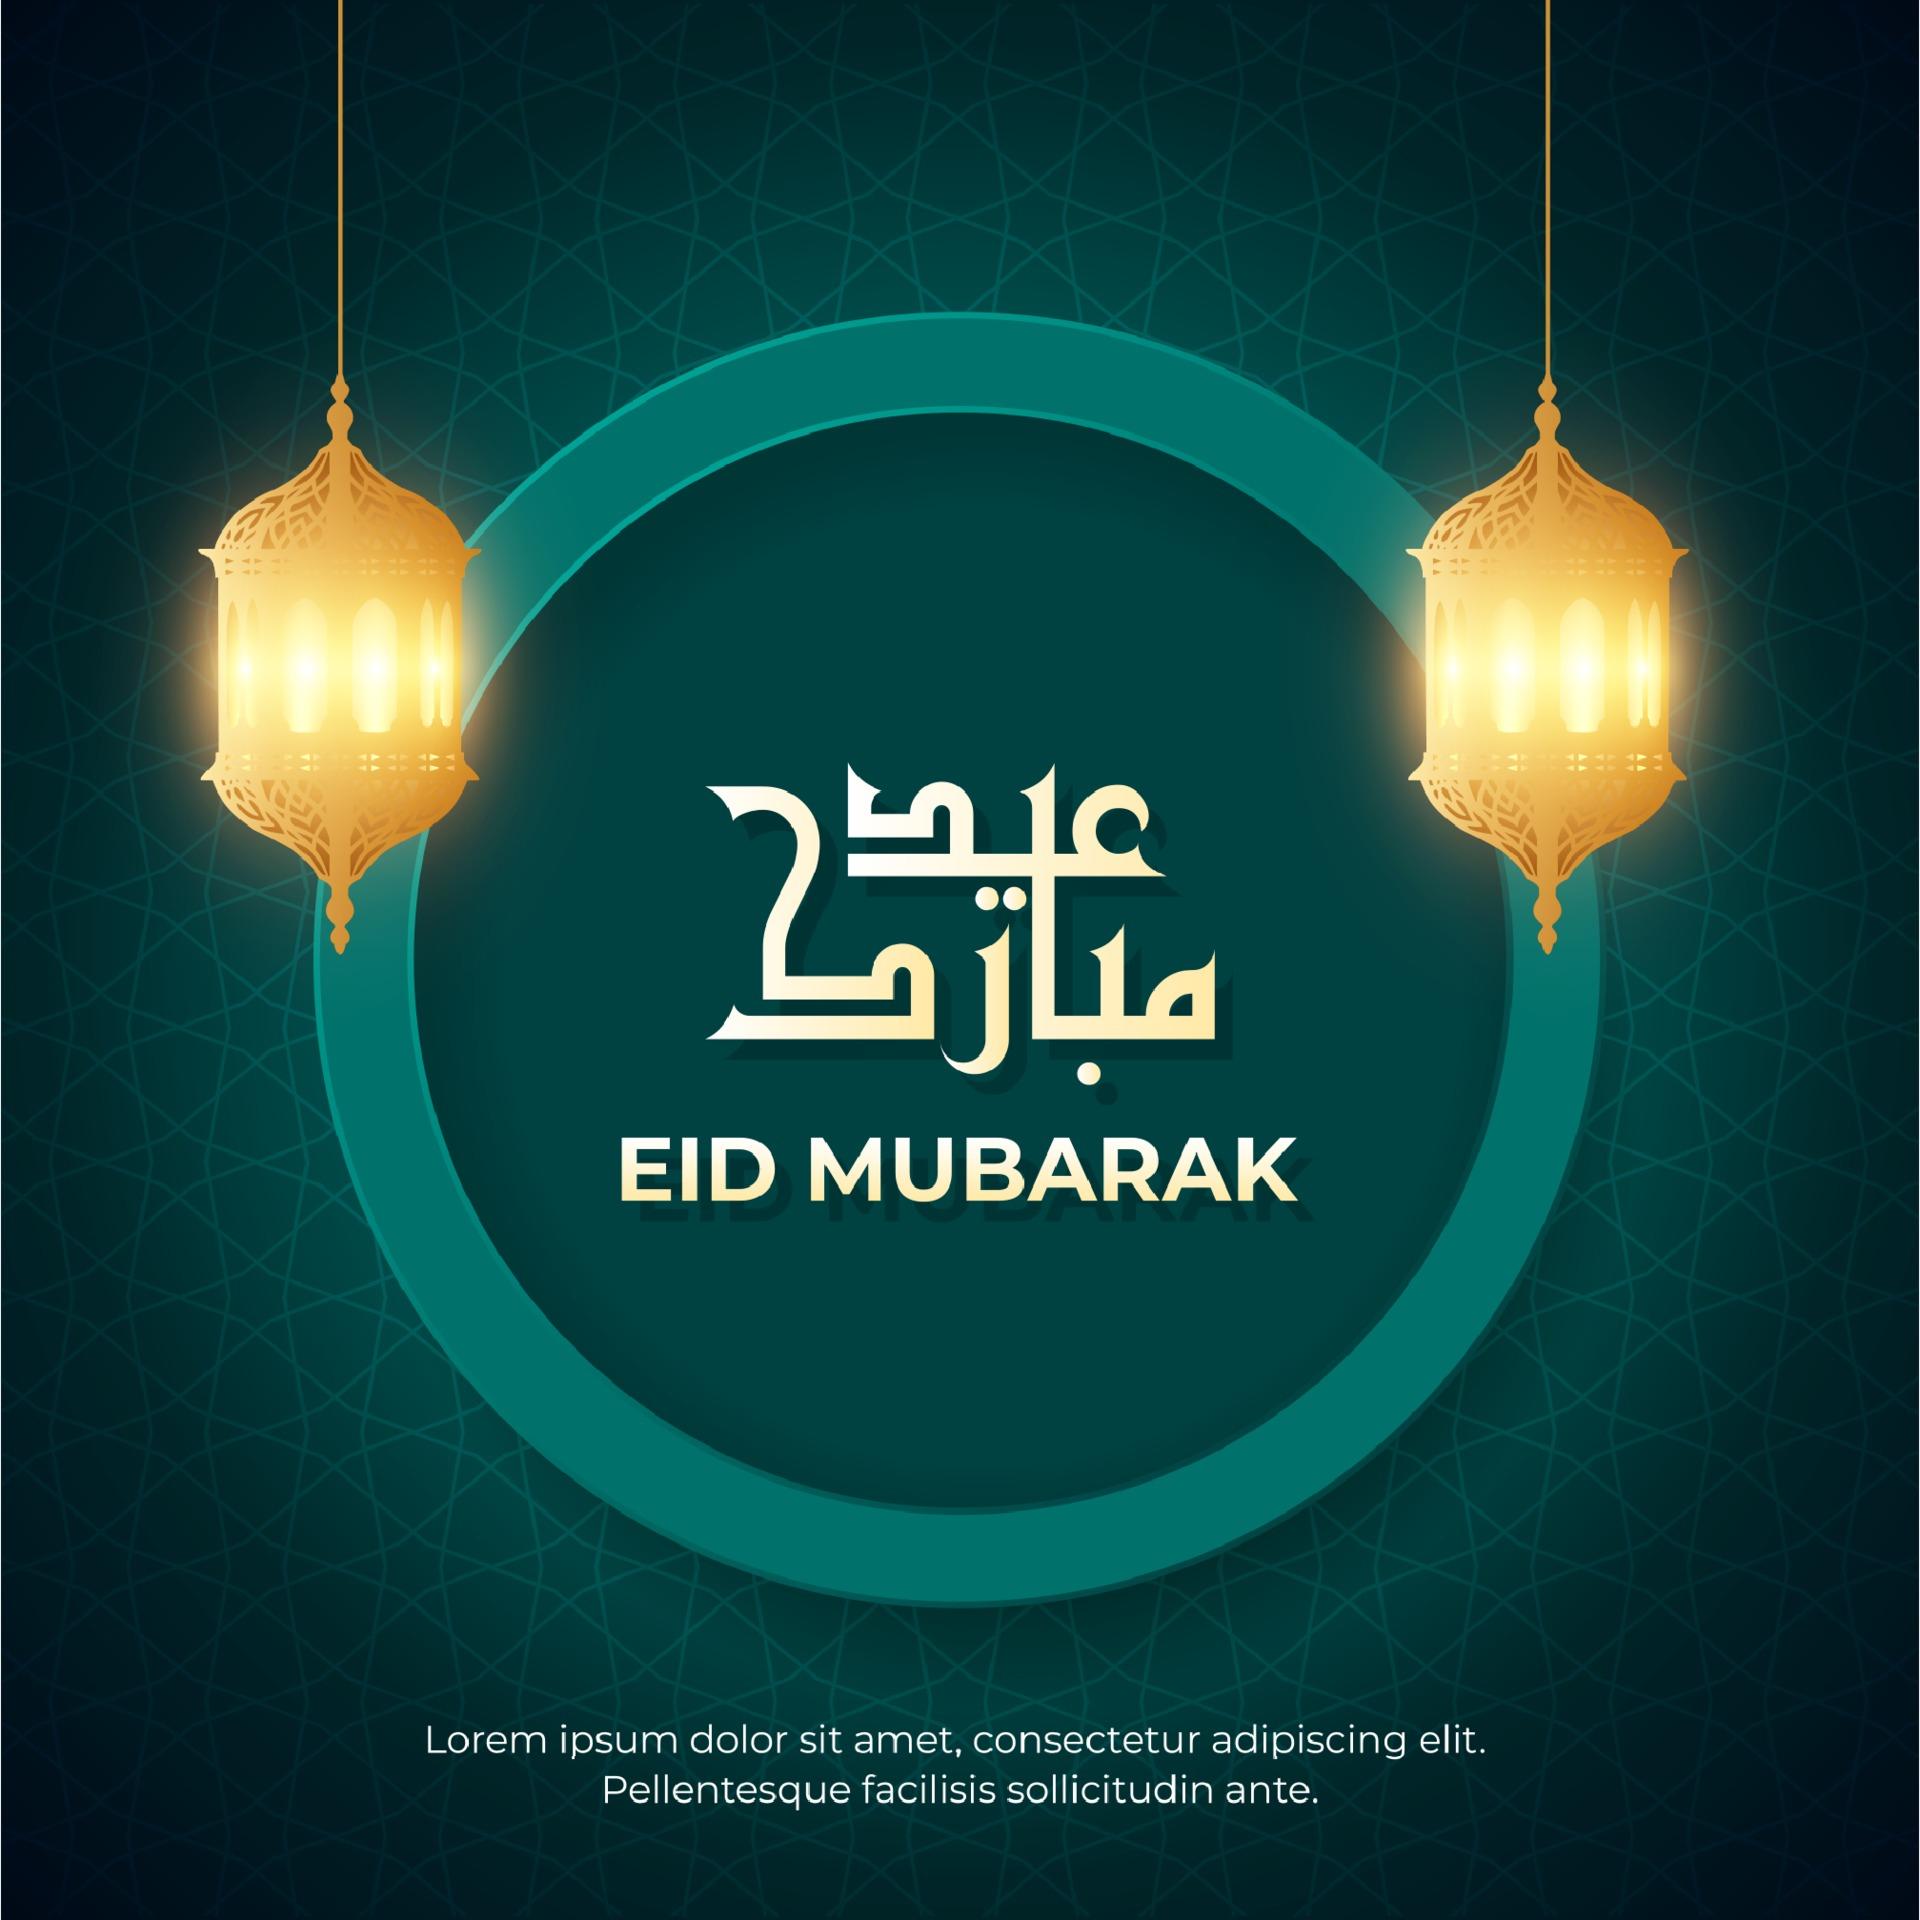 Green Eid Mubarak Greeting Card With Hanging Lantern 2198773 Vector Art At Vecteezy